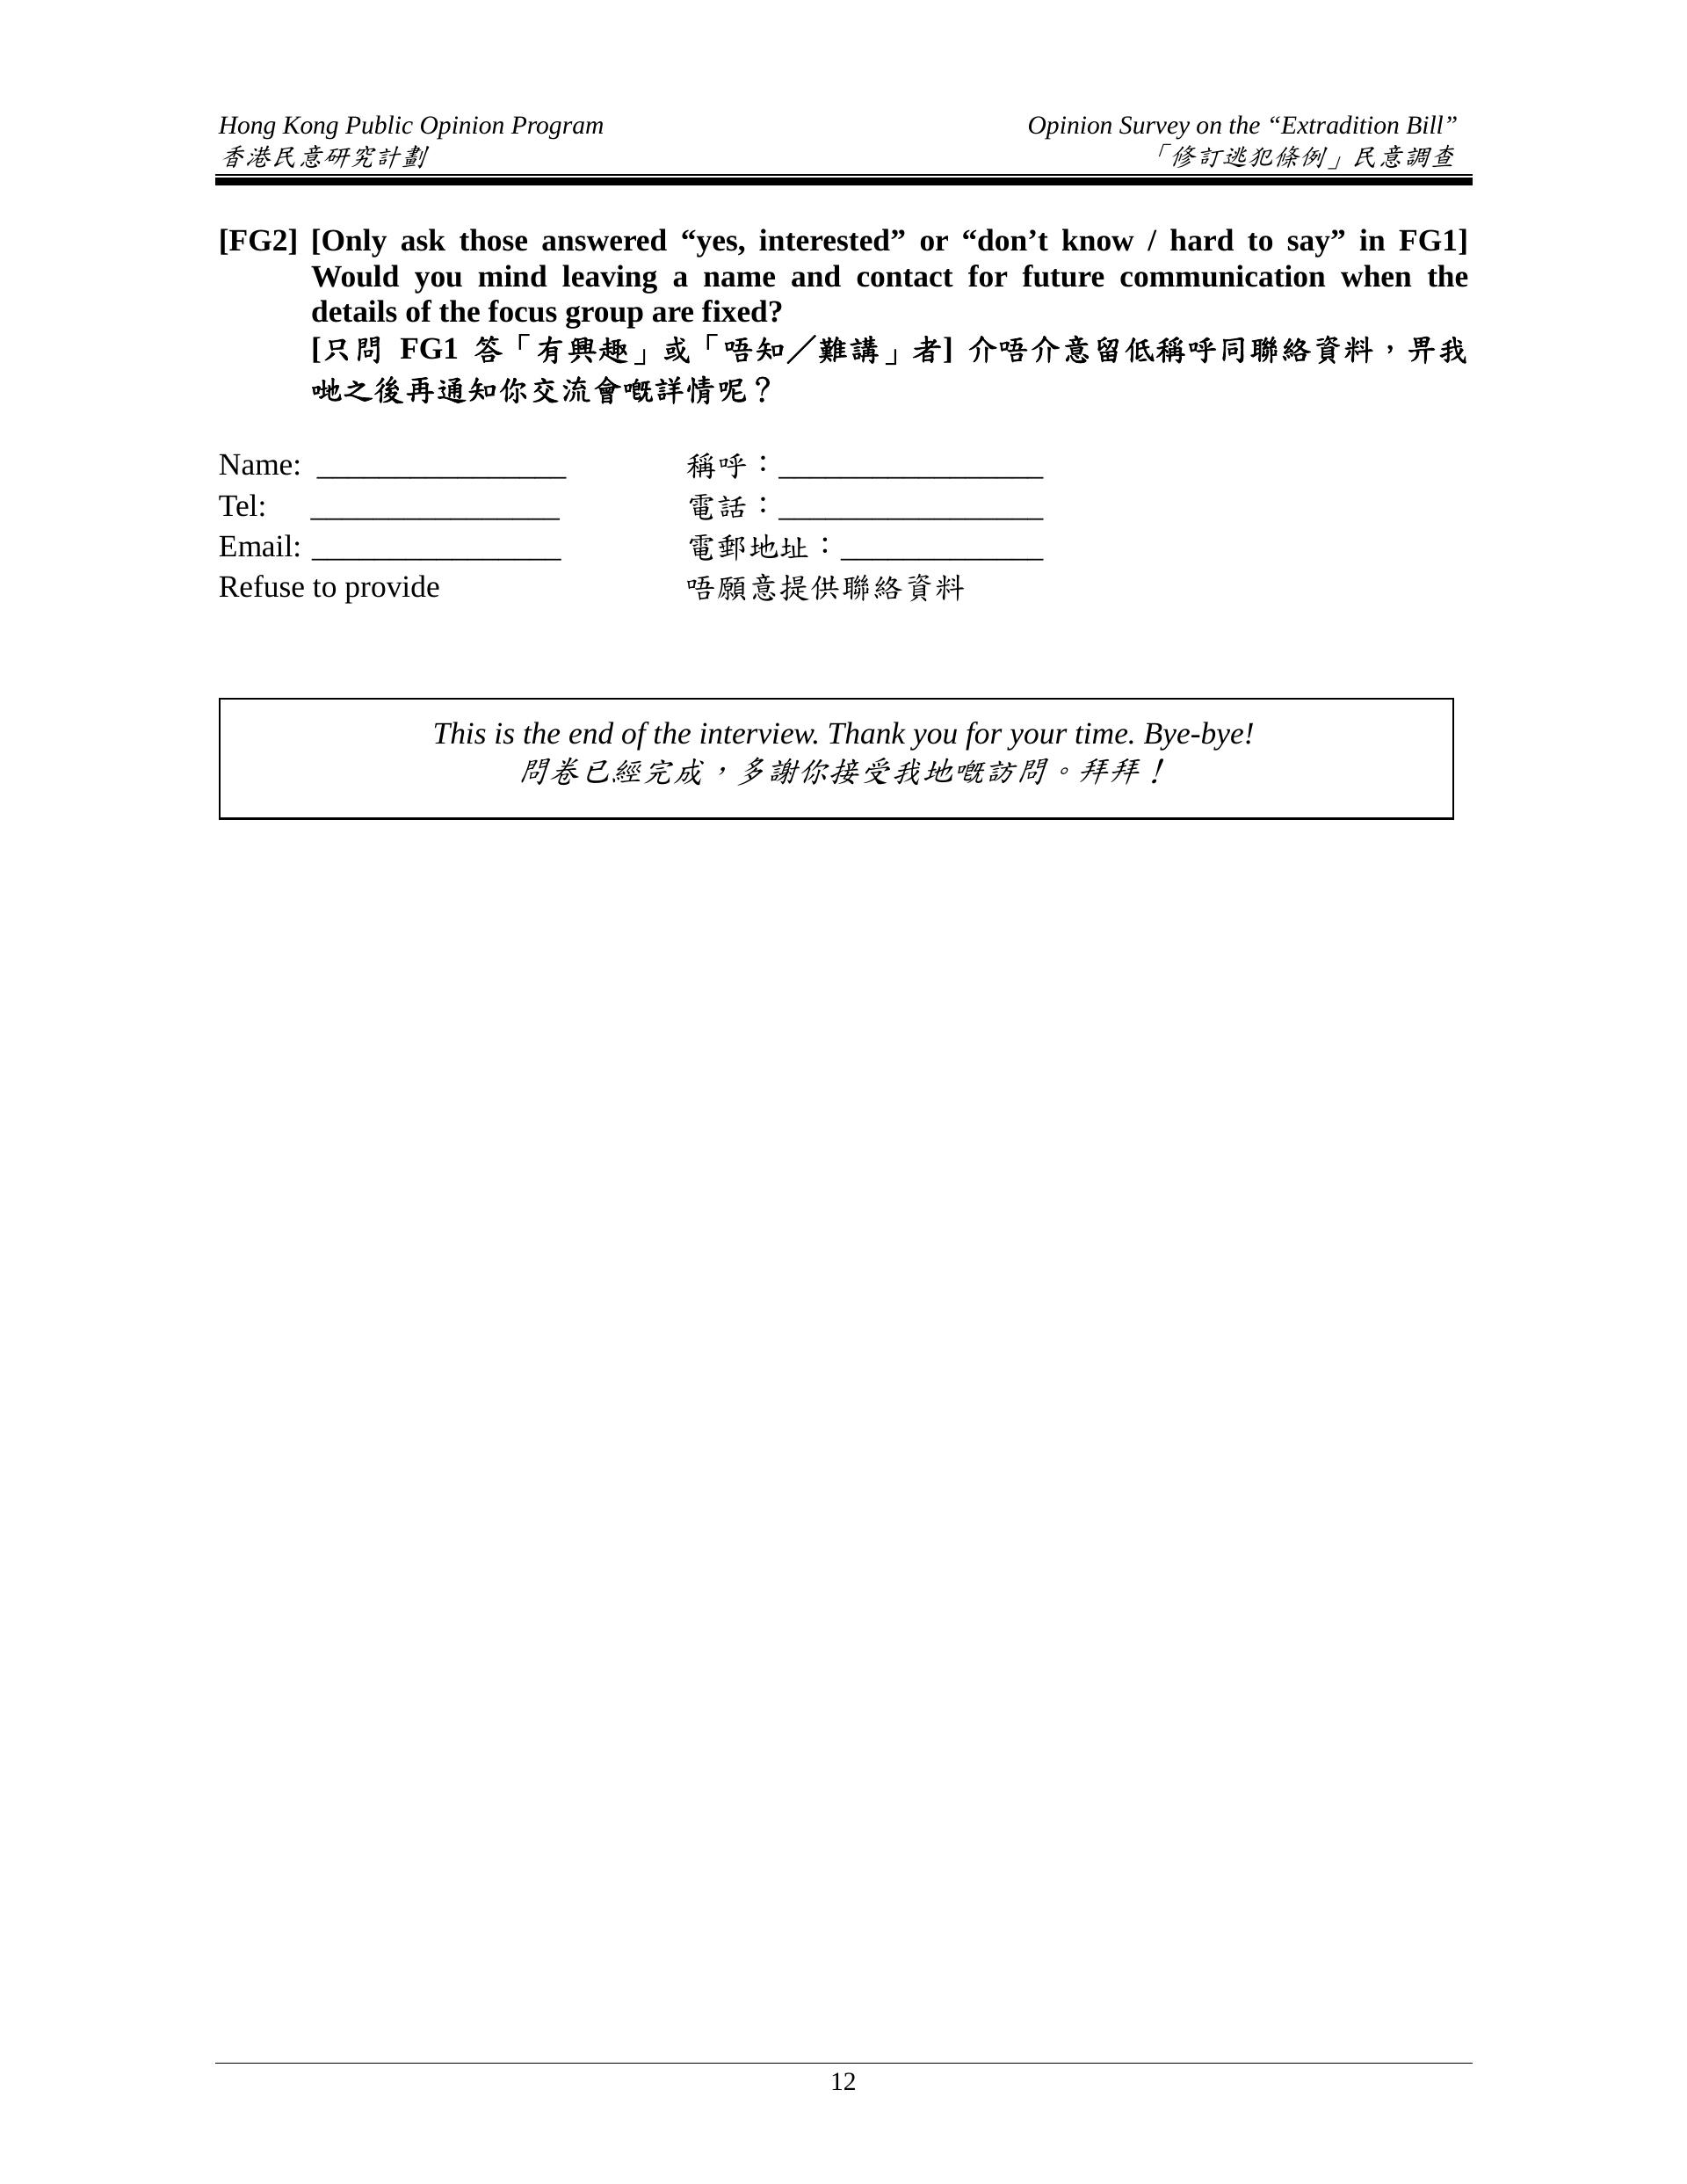 PDFtoJPG.me-12.jpg